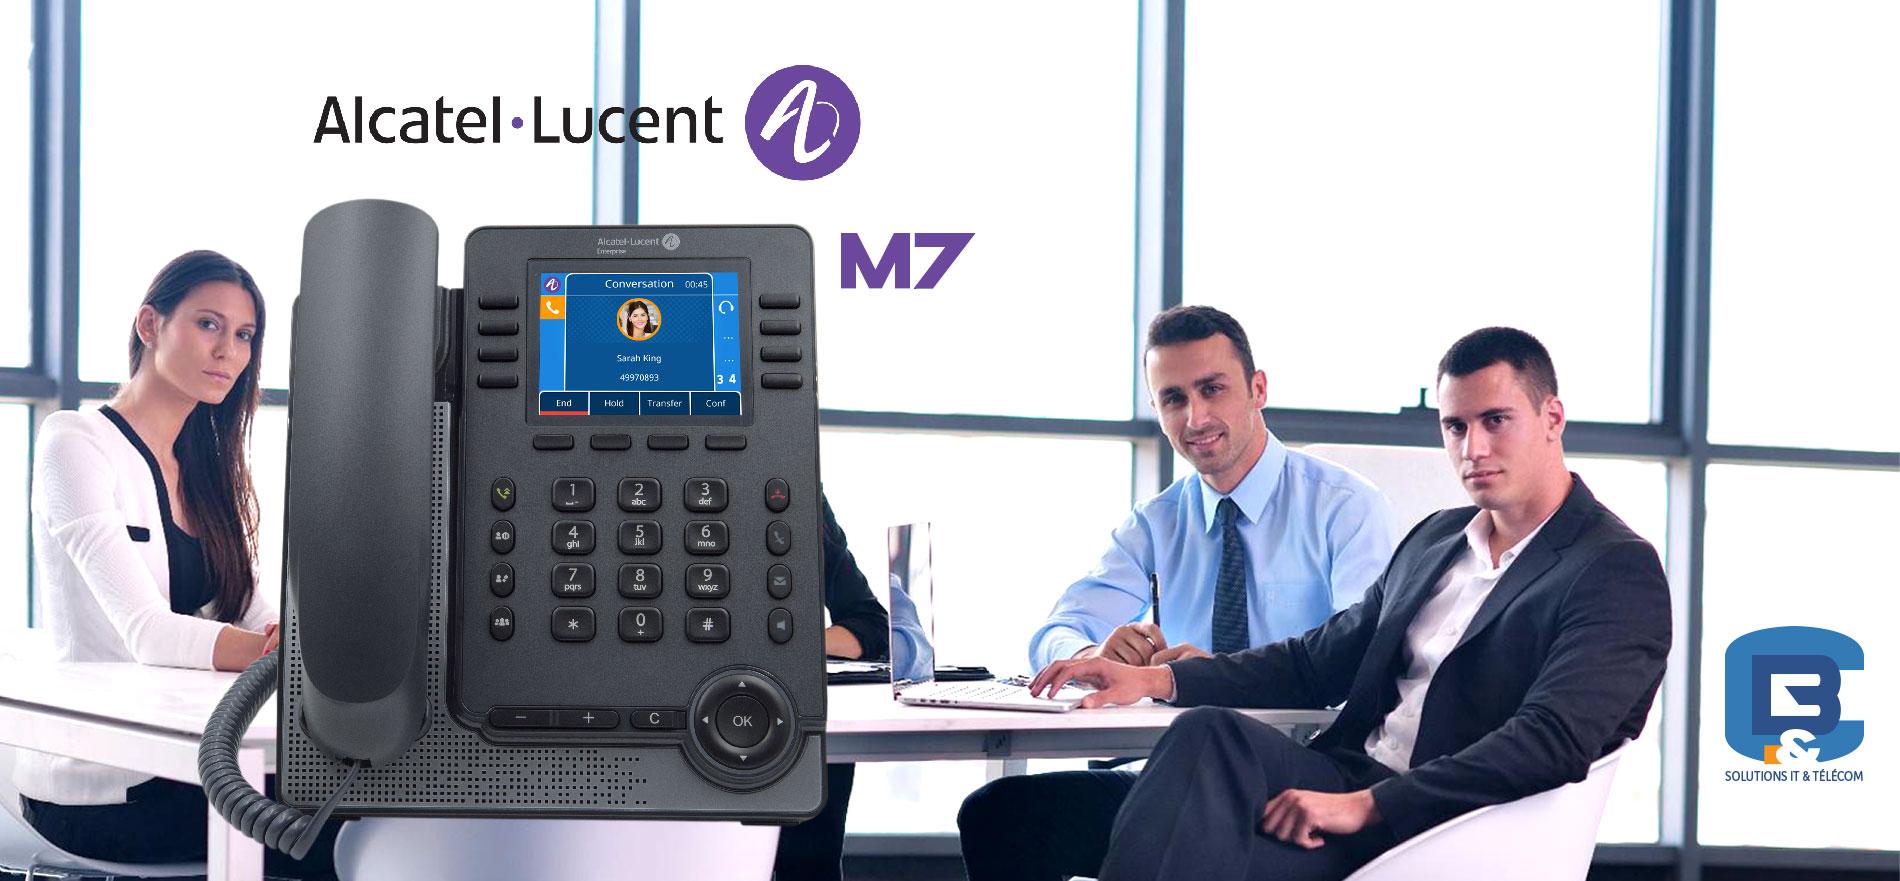 Téléphone SIP Professionnel M7 gamme Myriade alcatel by bc